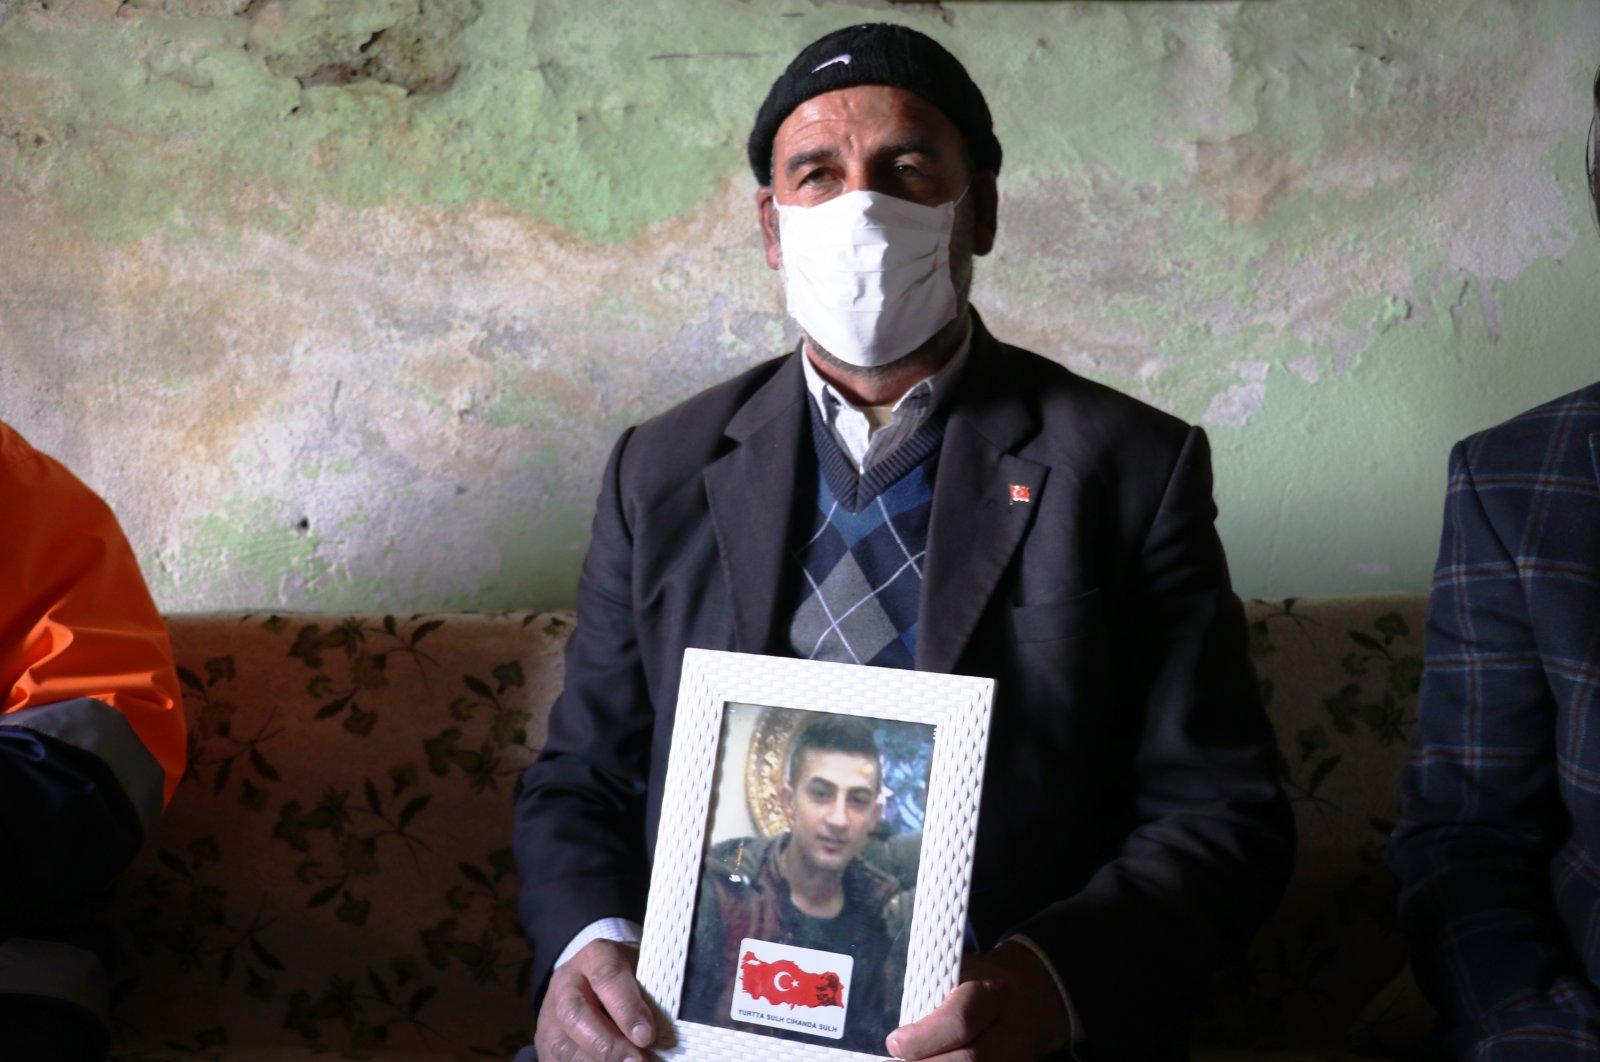 Salih Gökçe holds a photo of his son, who was kidnapped by PKK terrorists, Ağrı province, Turkey, May 3, 2020. (AA Photo)